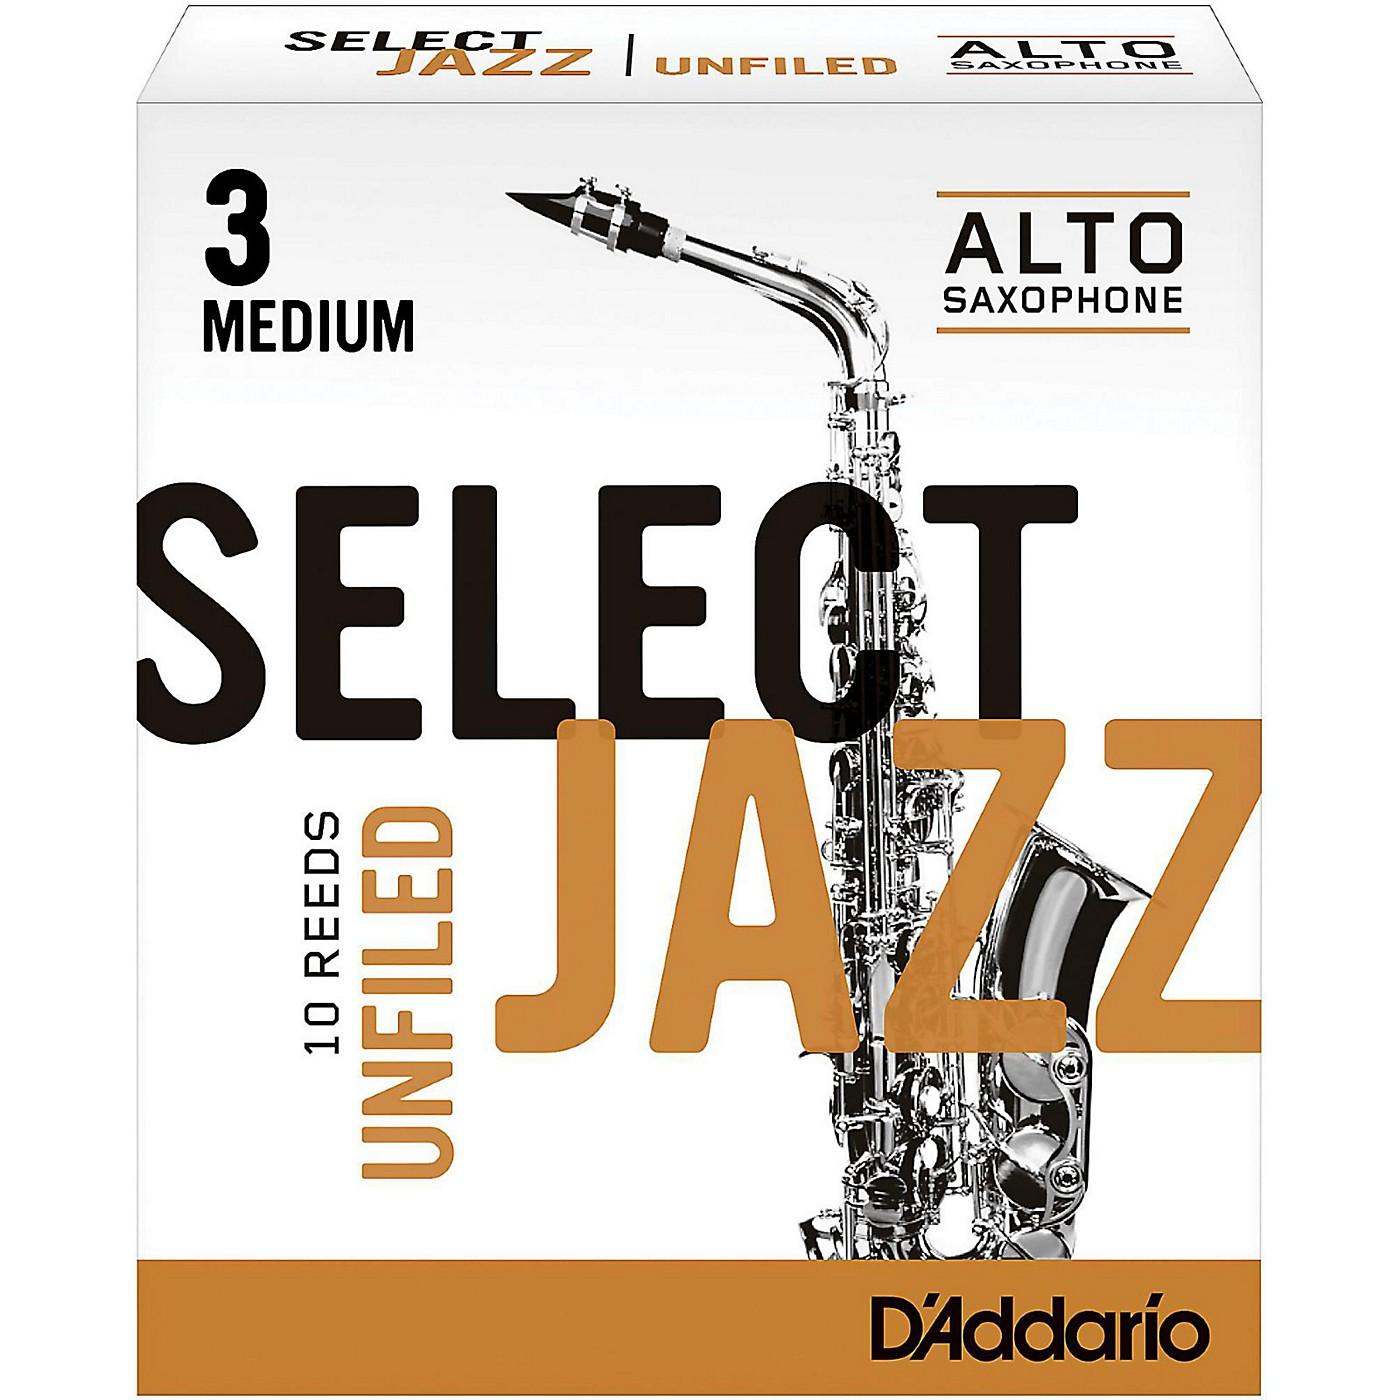 D'Addario Woodwinds Select Jazz Unfiled Alto Saxophone Reeds thumbnail